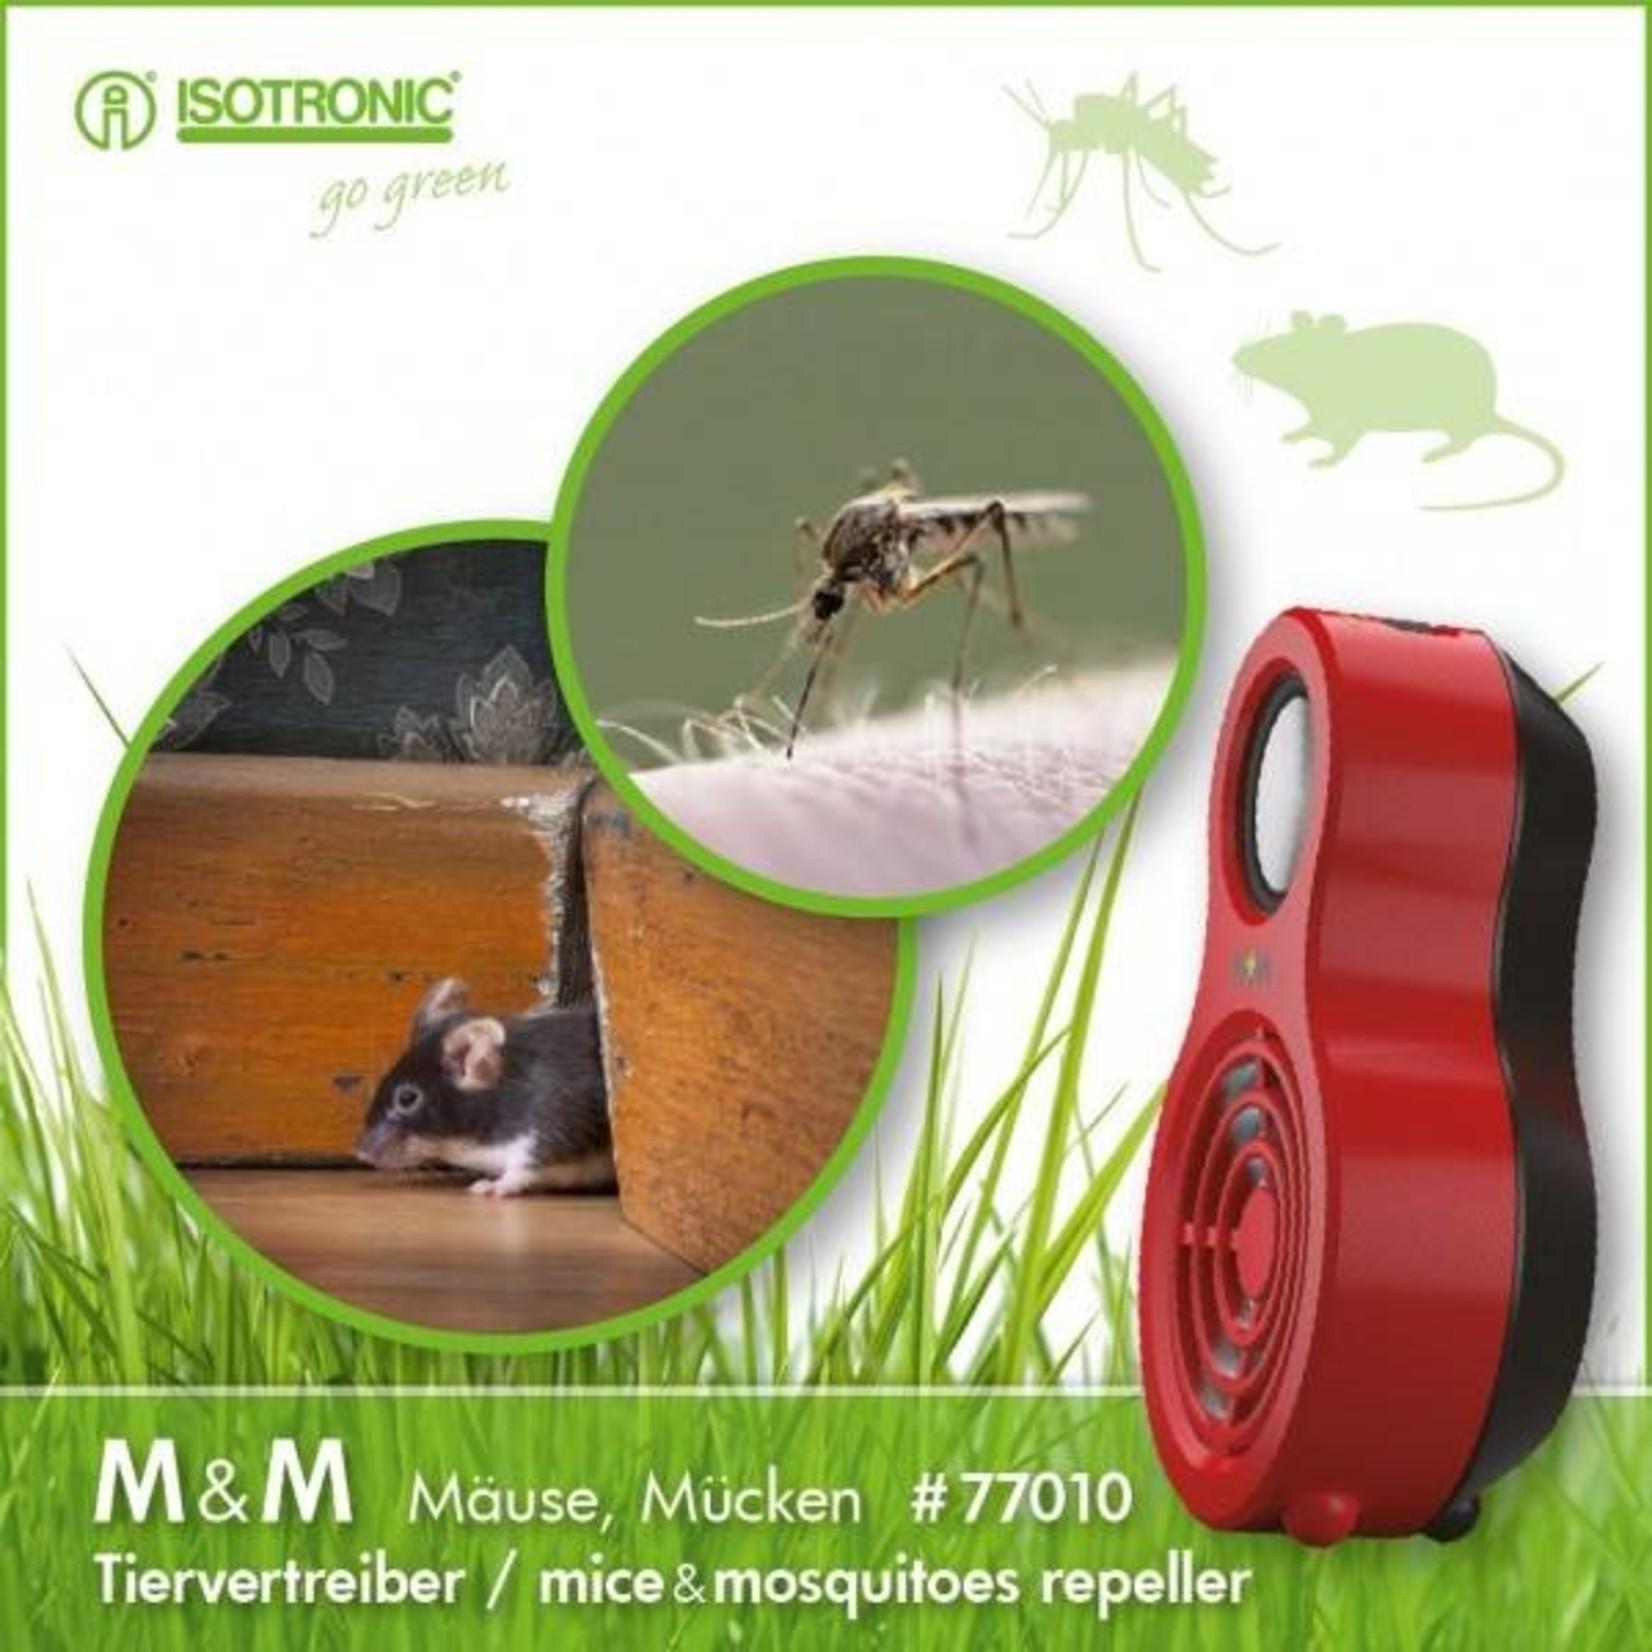 Isotronic Muizen, muggen en marterverjager